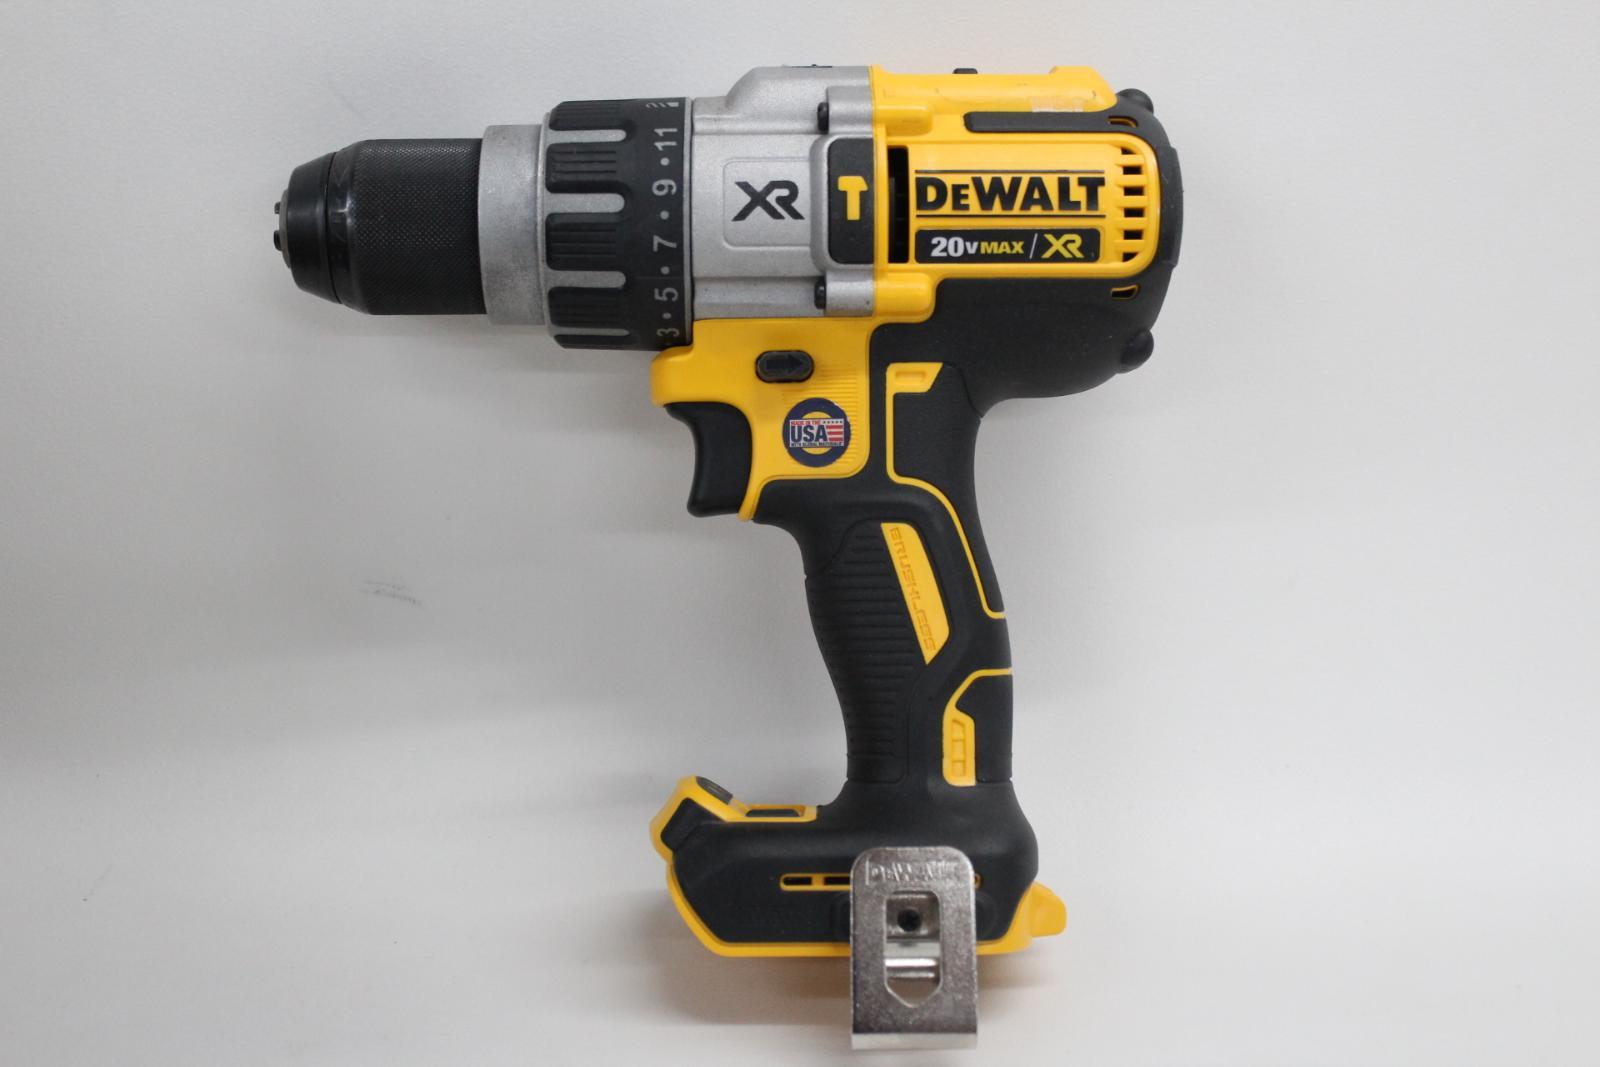 DEWALT-1-2-034-Brushless-Xr-Martillo-Taladro-Inalambrico-Controlador-Inalambrico-Modelo-DCD996-20v miniatura 12